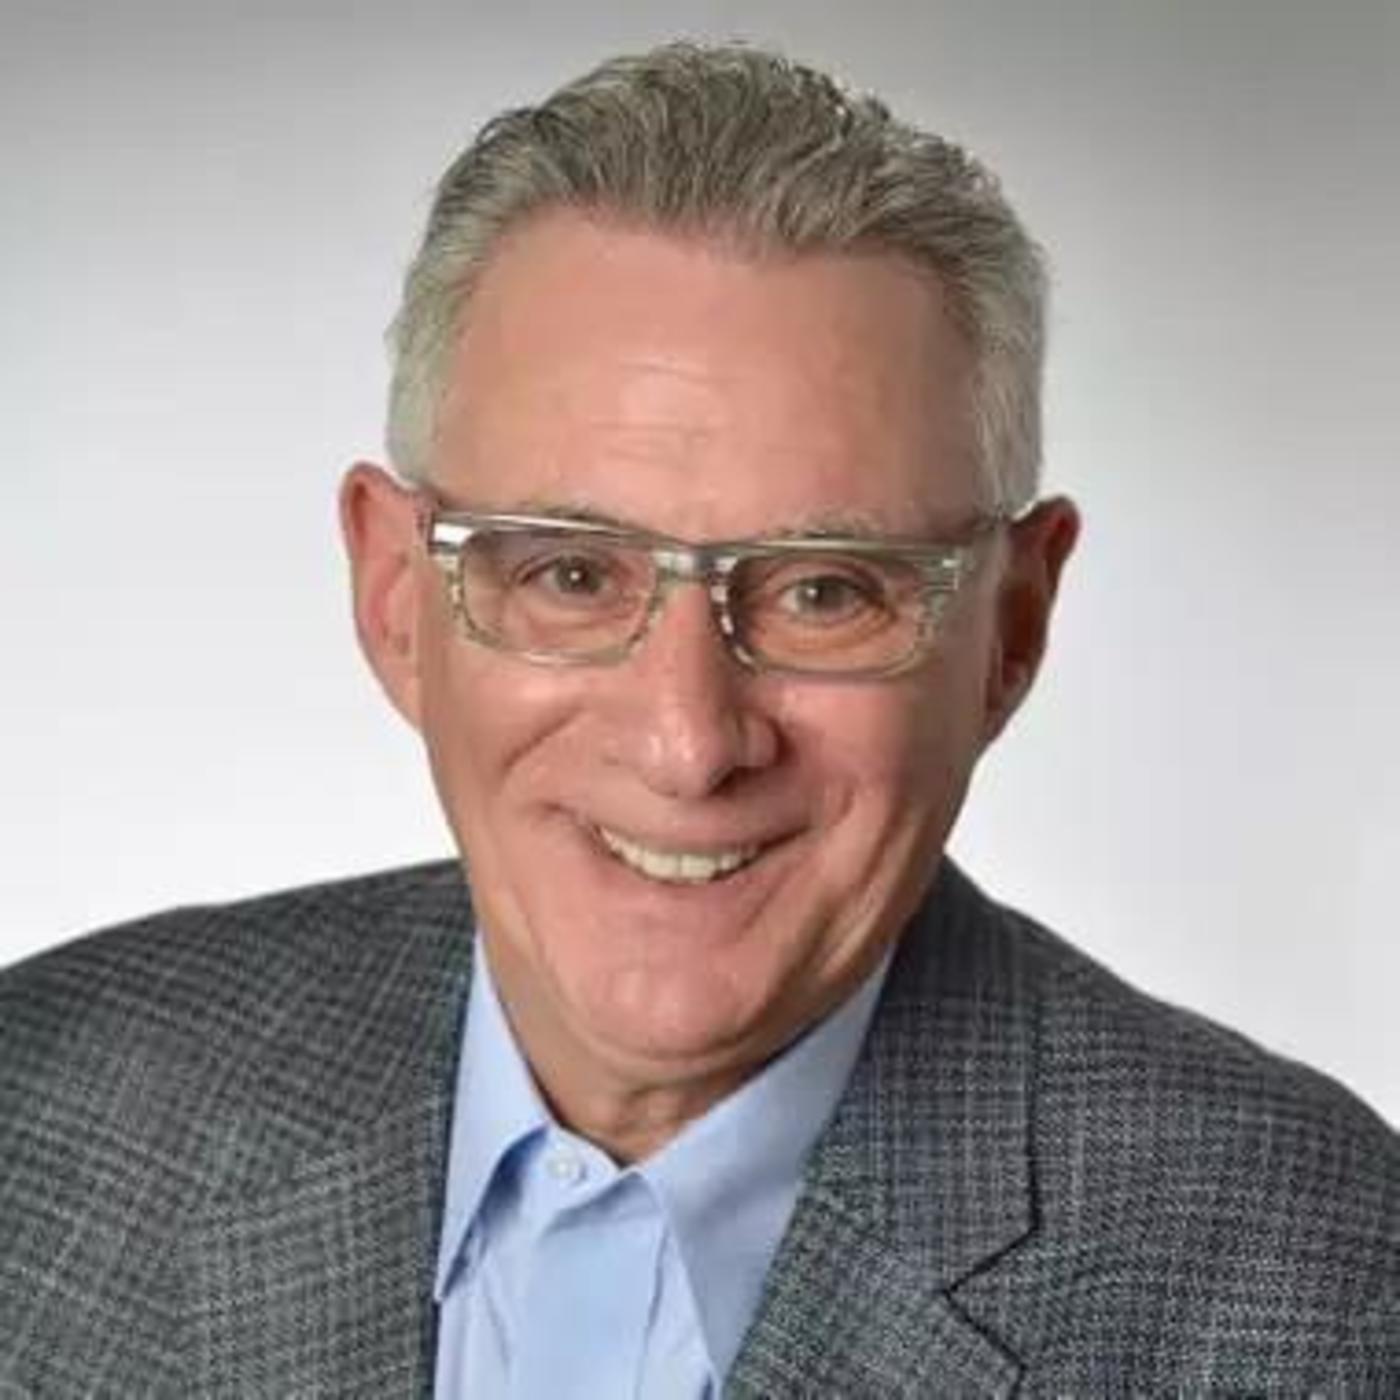 Sherwood Partners(一家商业咨询公司) 的联席总裁Martin Pichinson